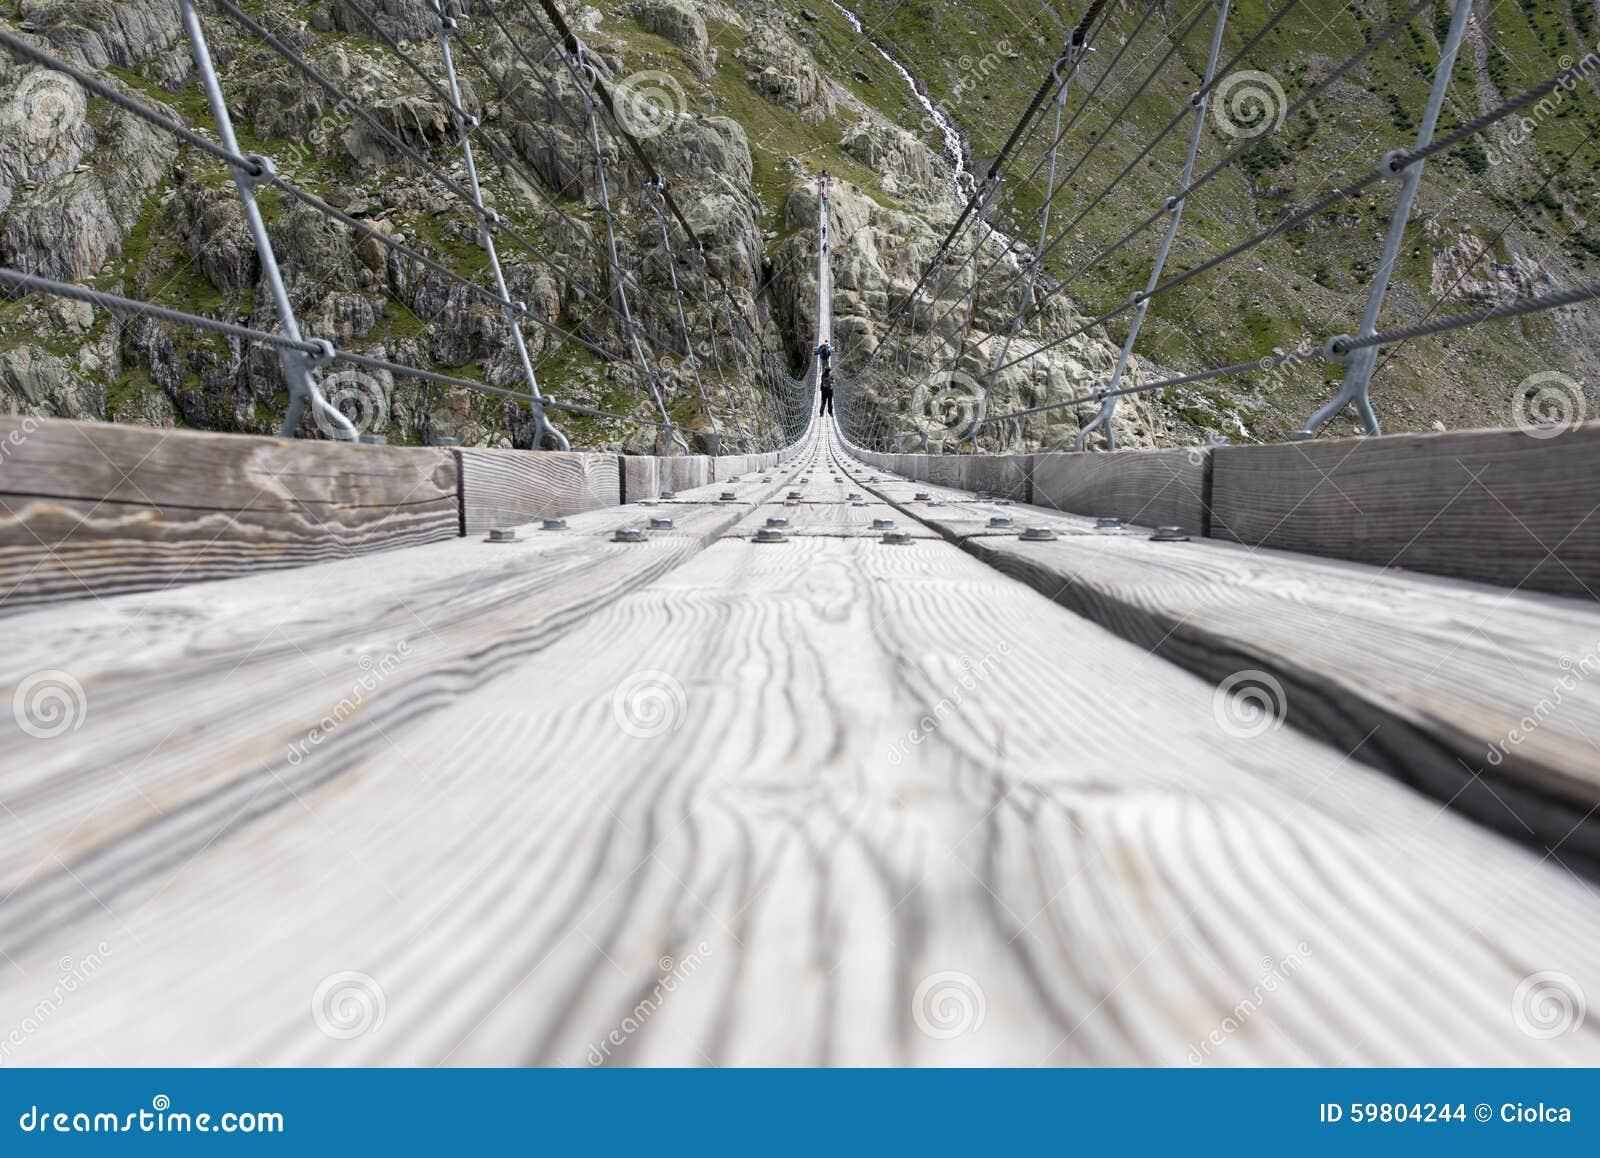 Trift Bridge, Switzerland stock photo  Image of river - 59804244